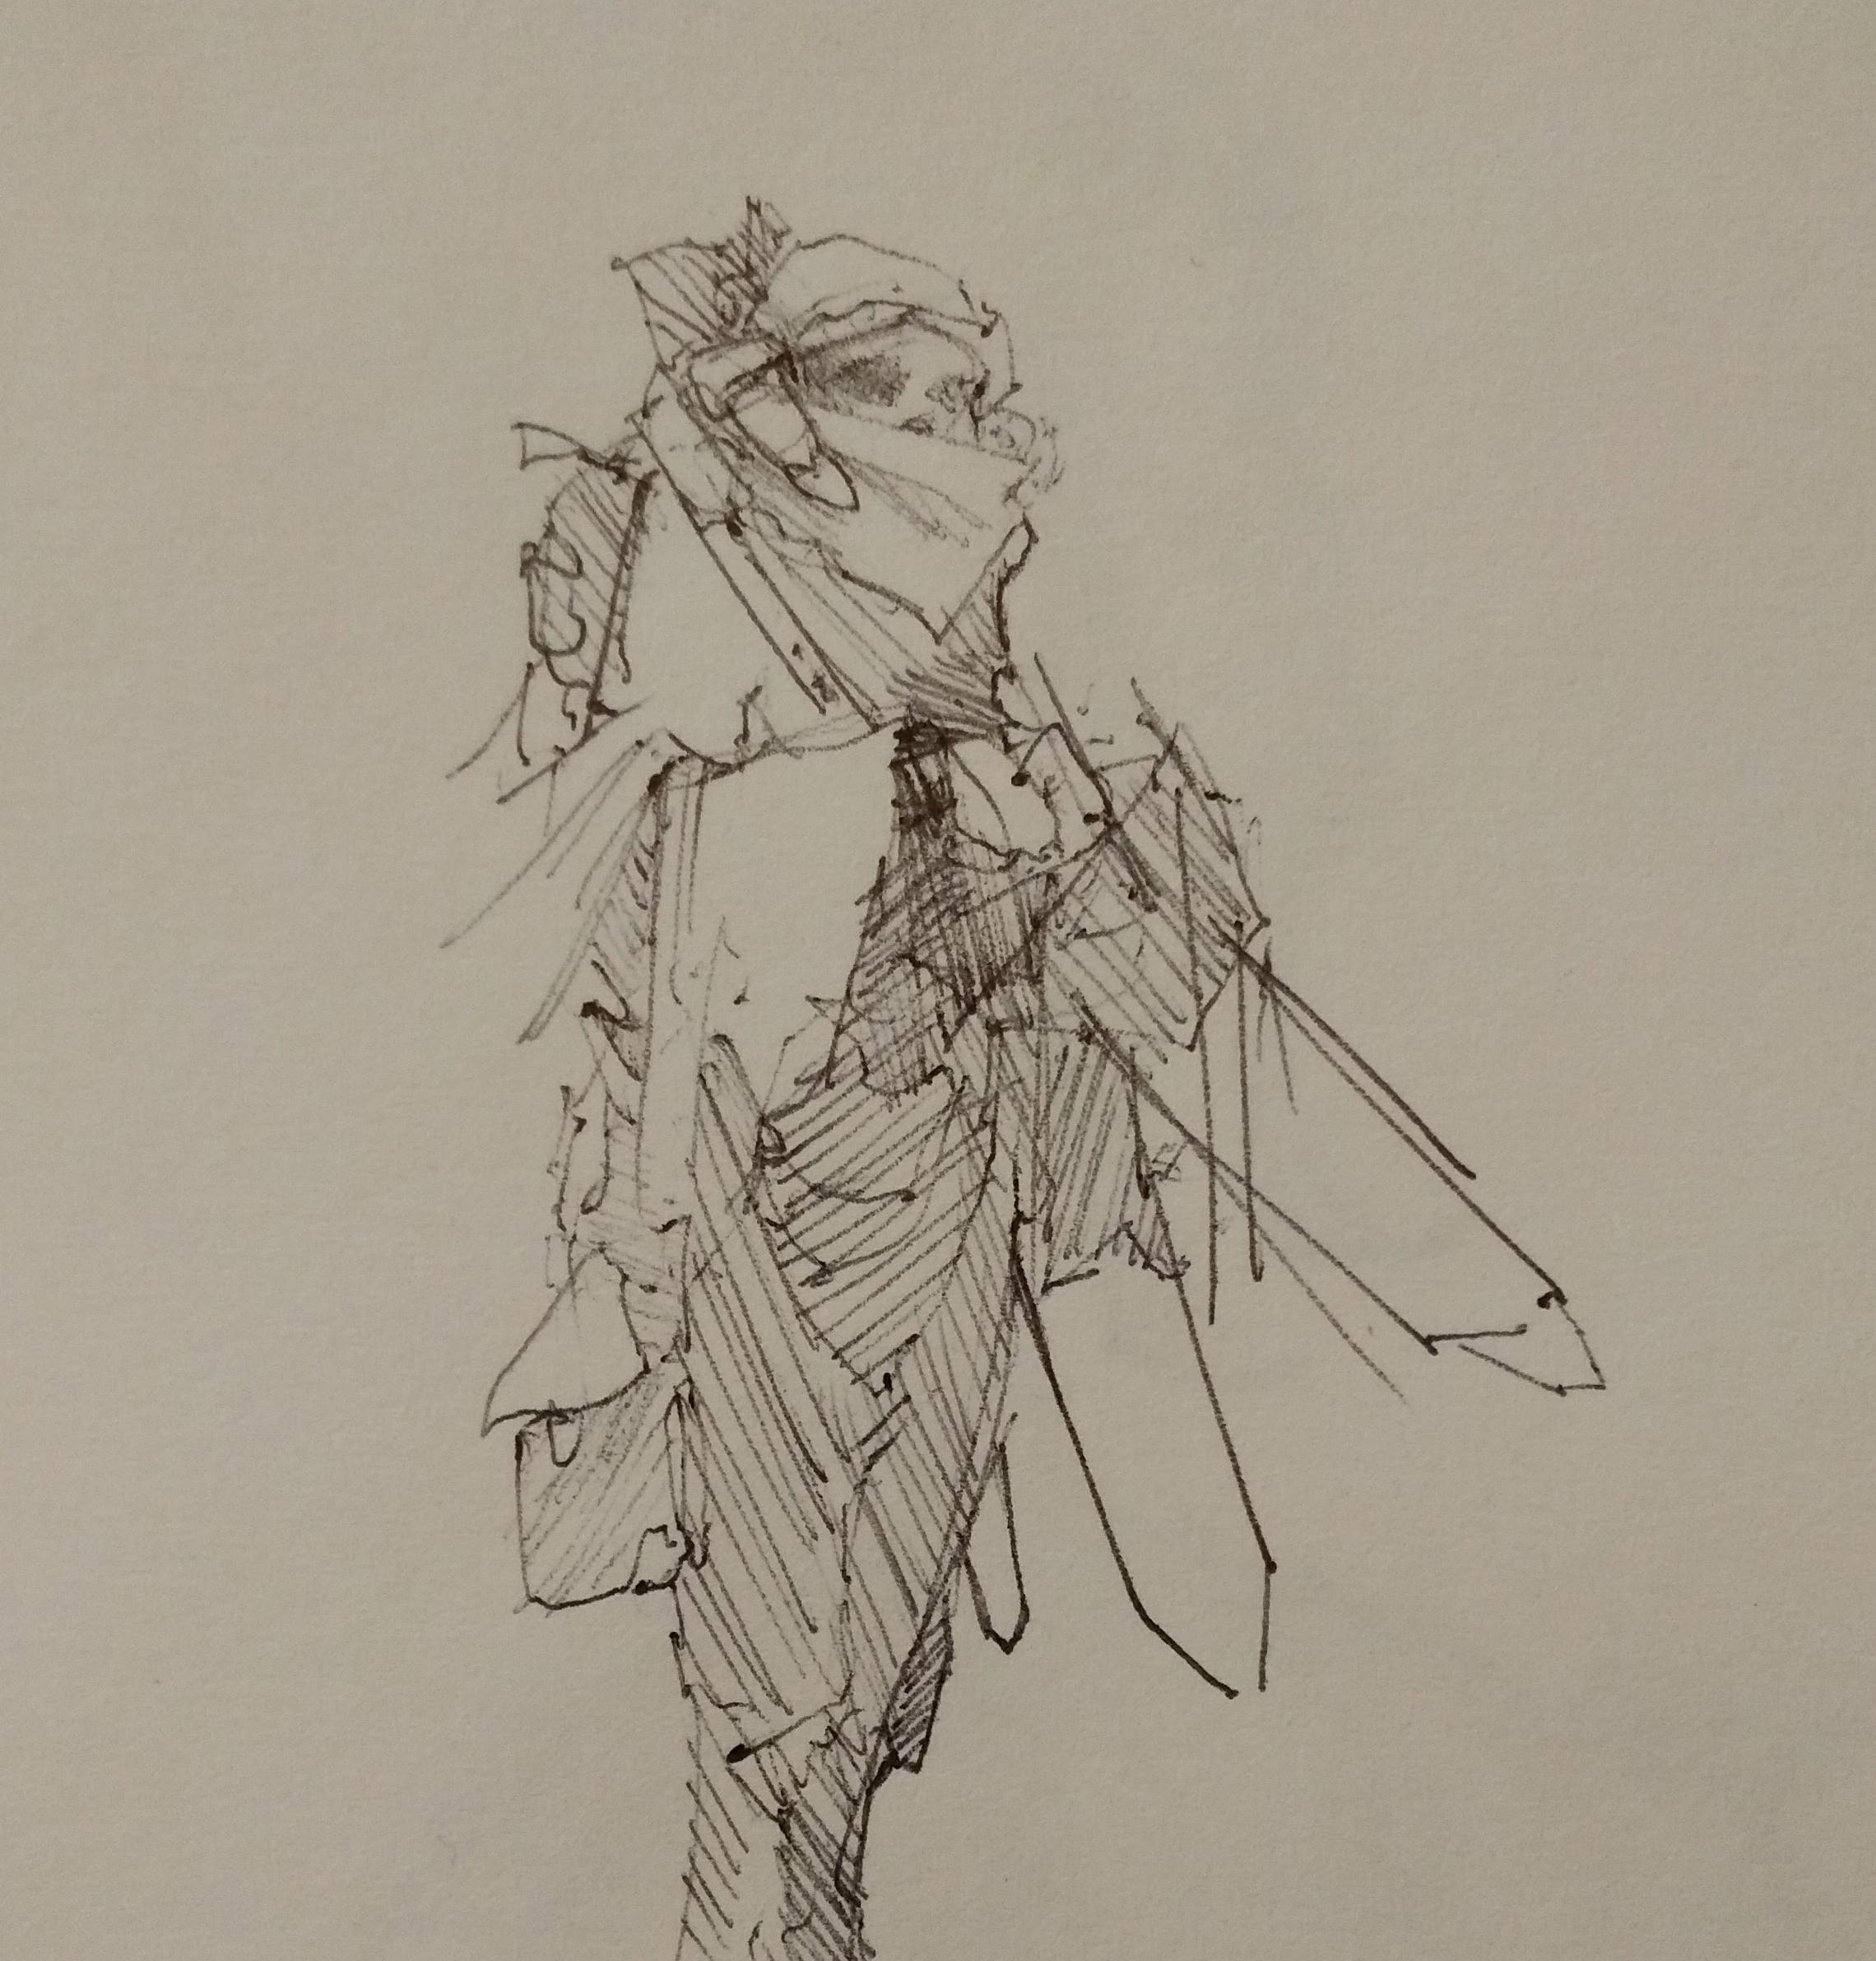 ScavengerSketch.jpg